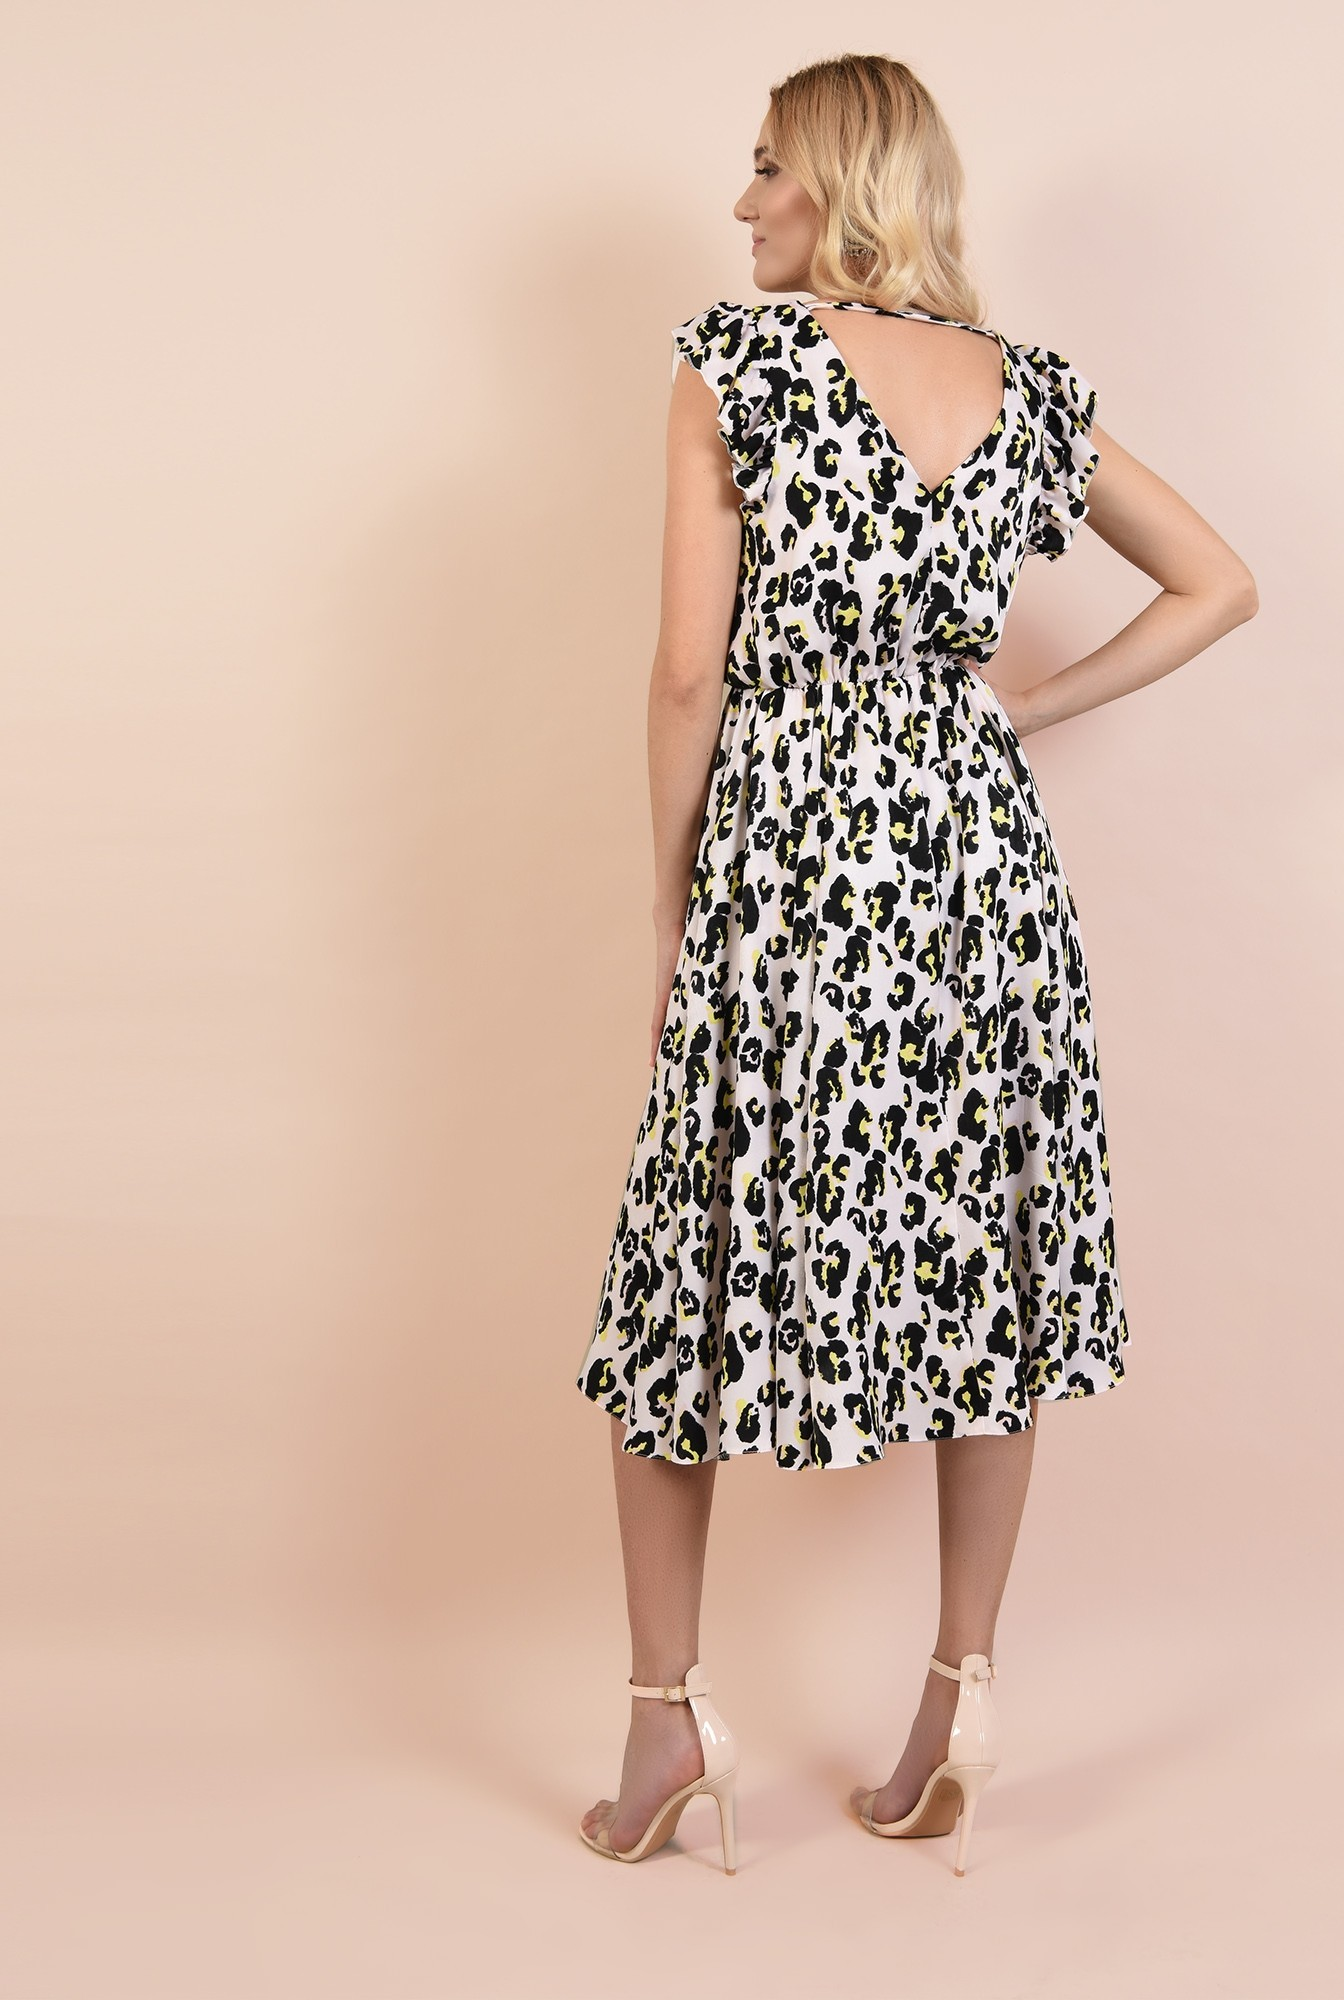 1 - rochie eleganta, cu motive, talie pe elastic, spate decoltat, volane